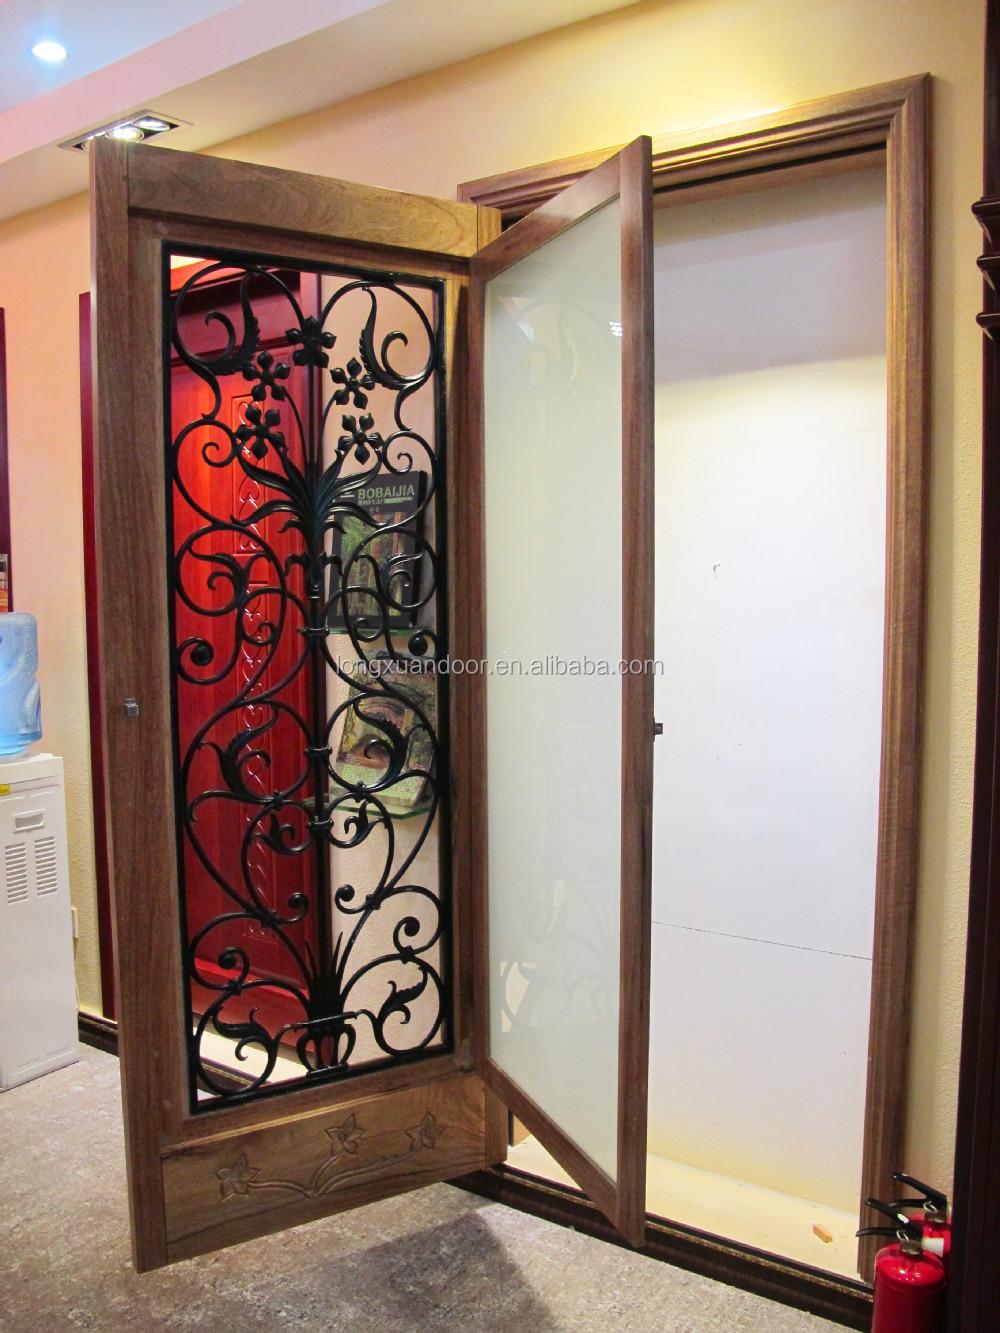 Wrought iron glass door panels clear varnish wood door for Wood doors with wrought iron